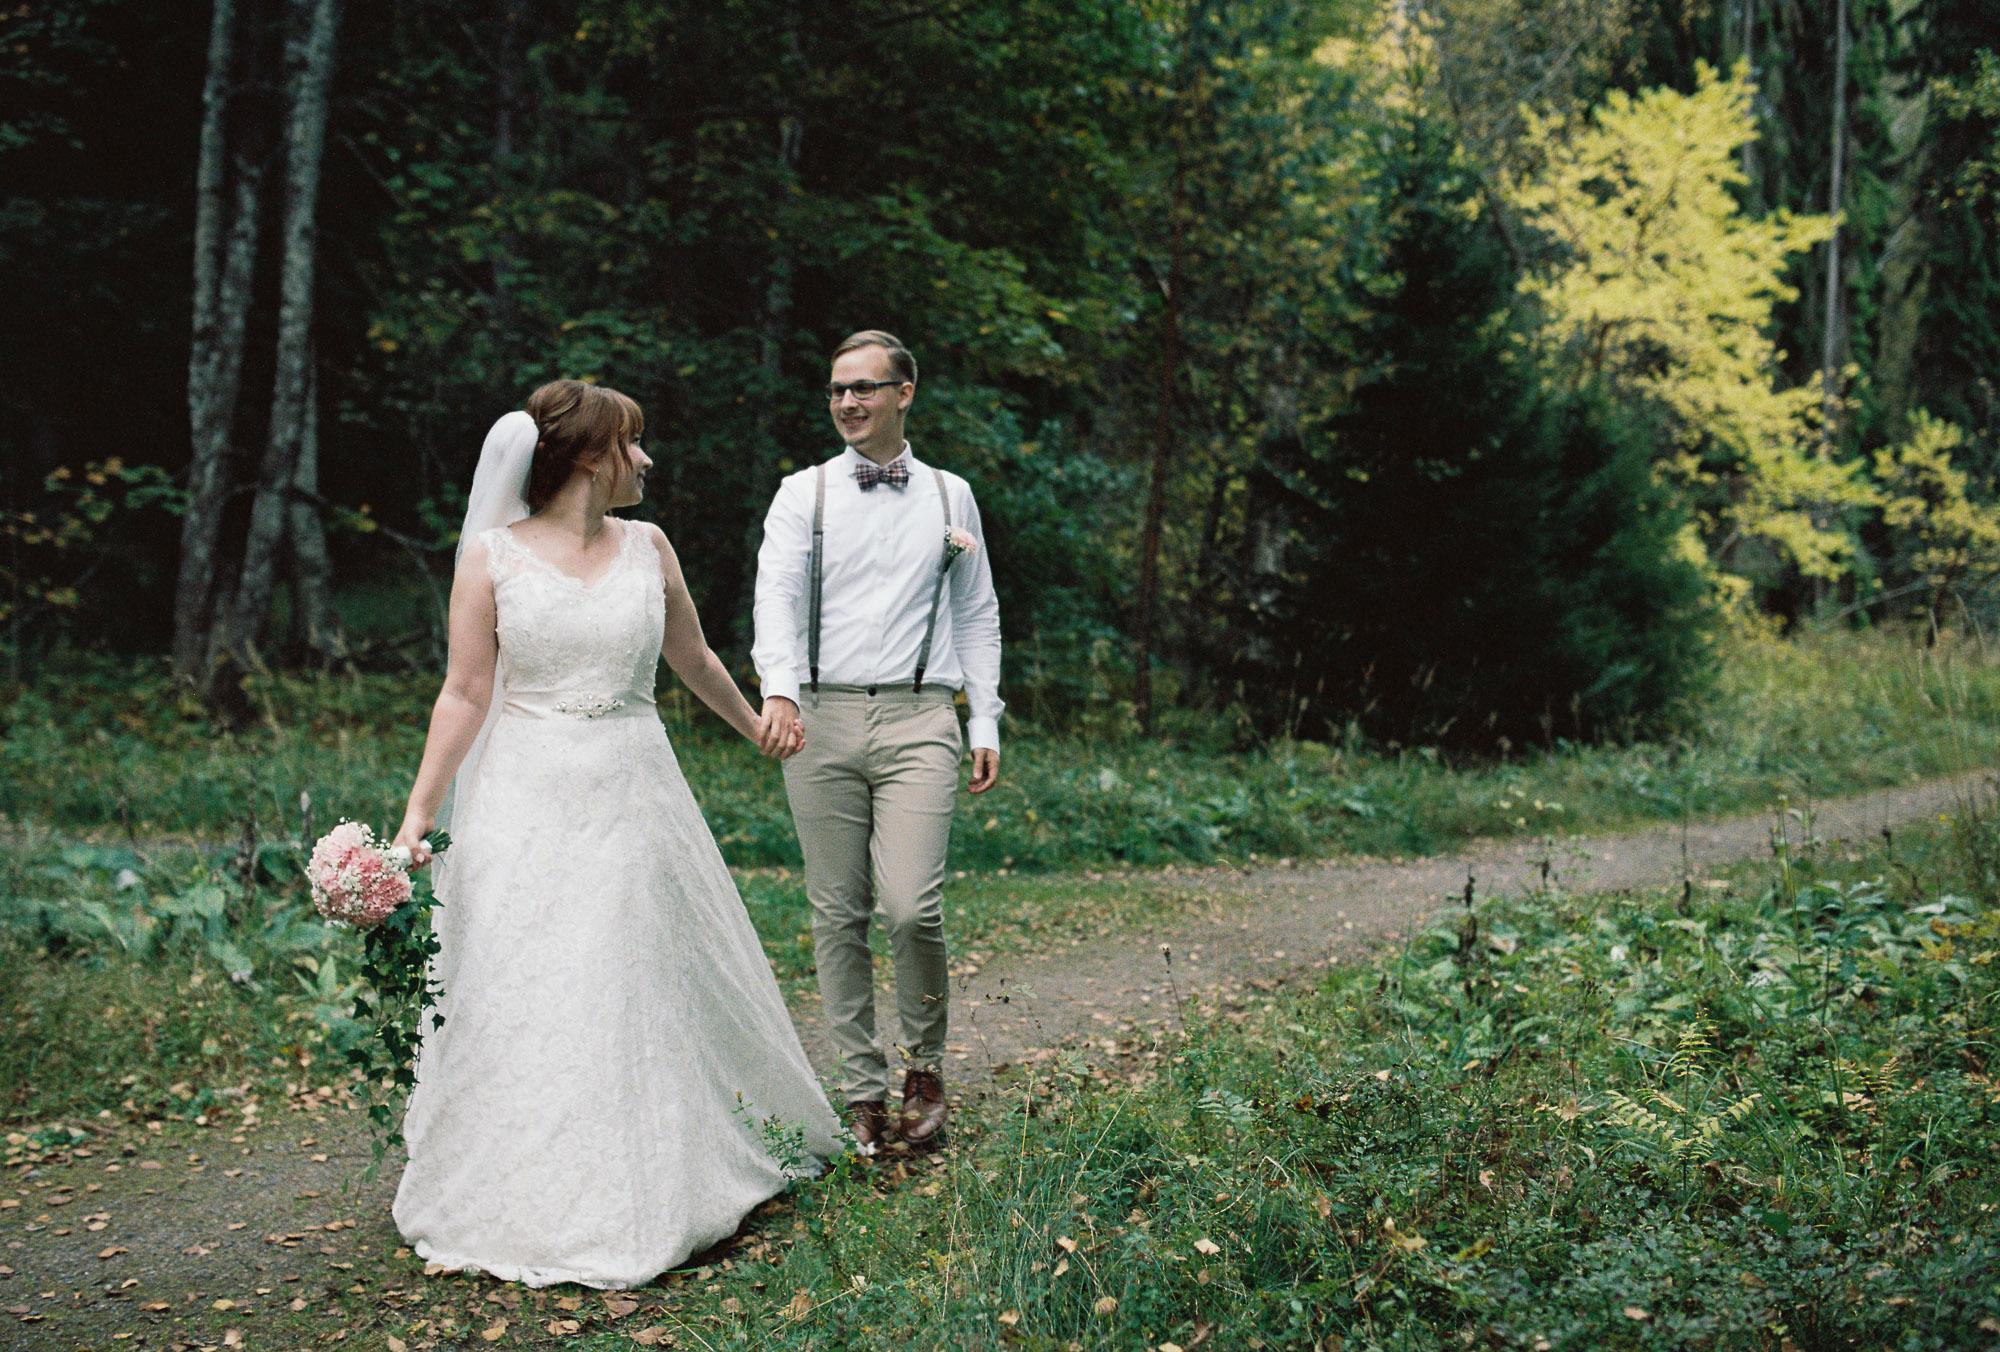 jere-satamo-analog-film-wedding-photographer-finland-109.jpg